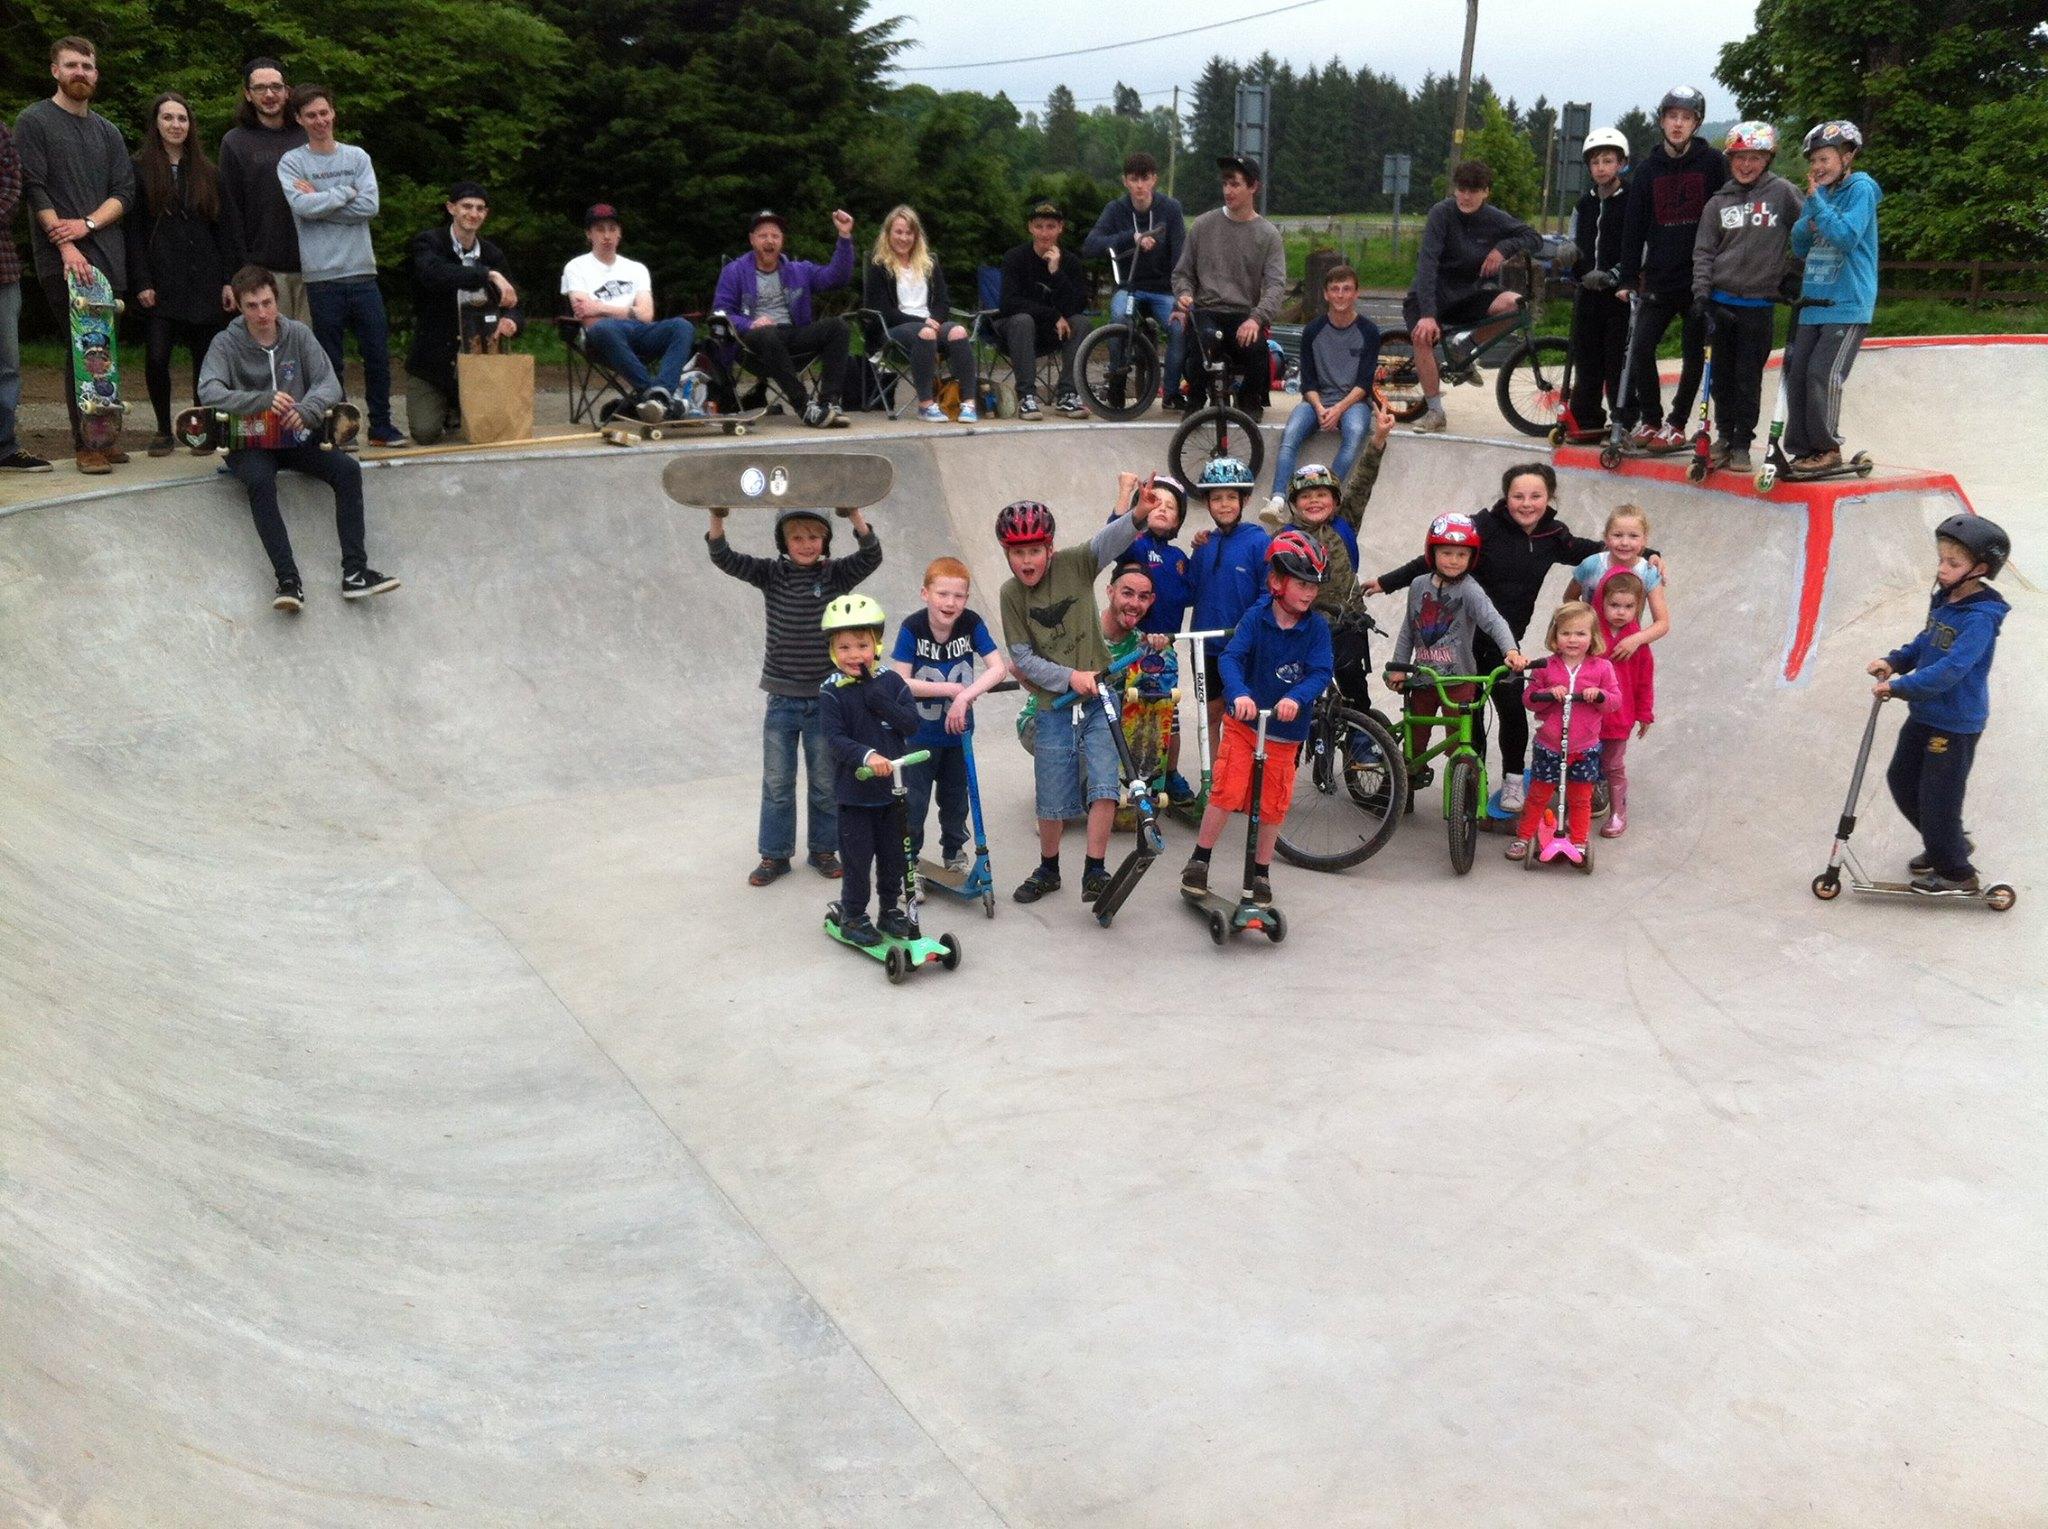 Comrie Skate-Park